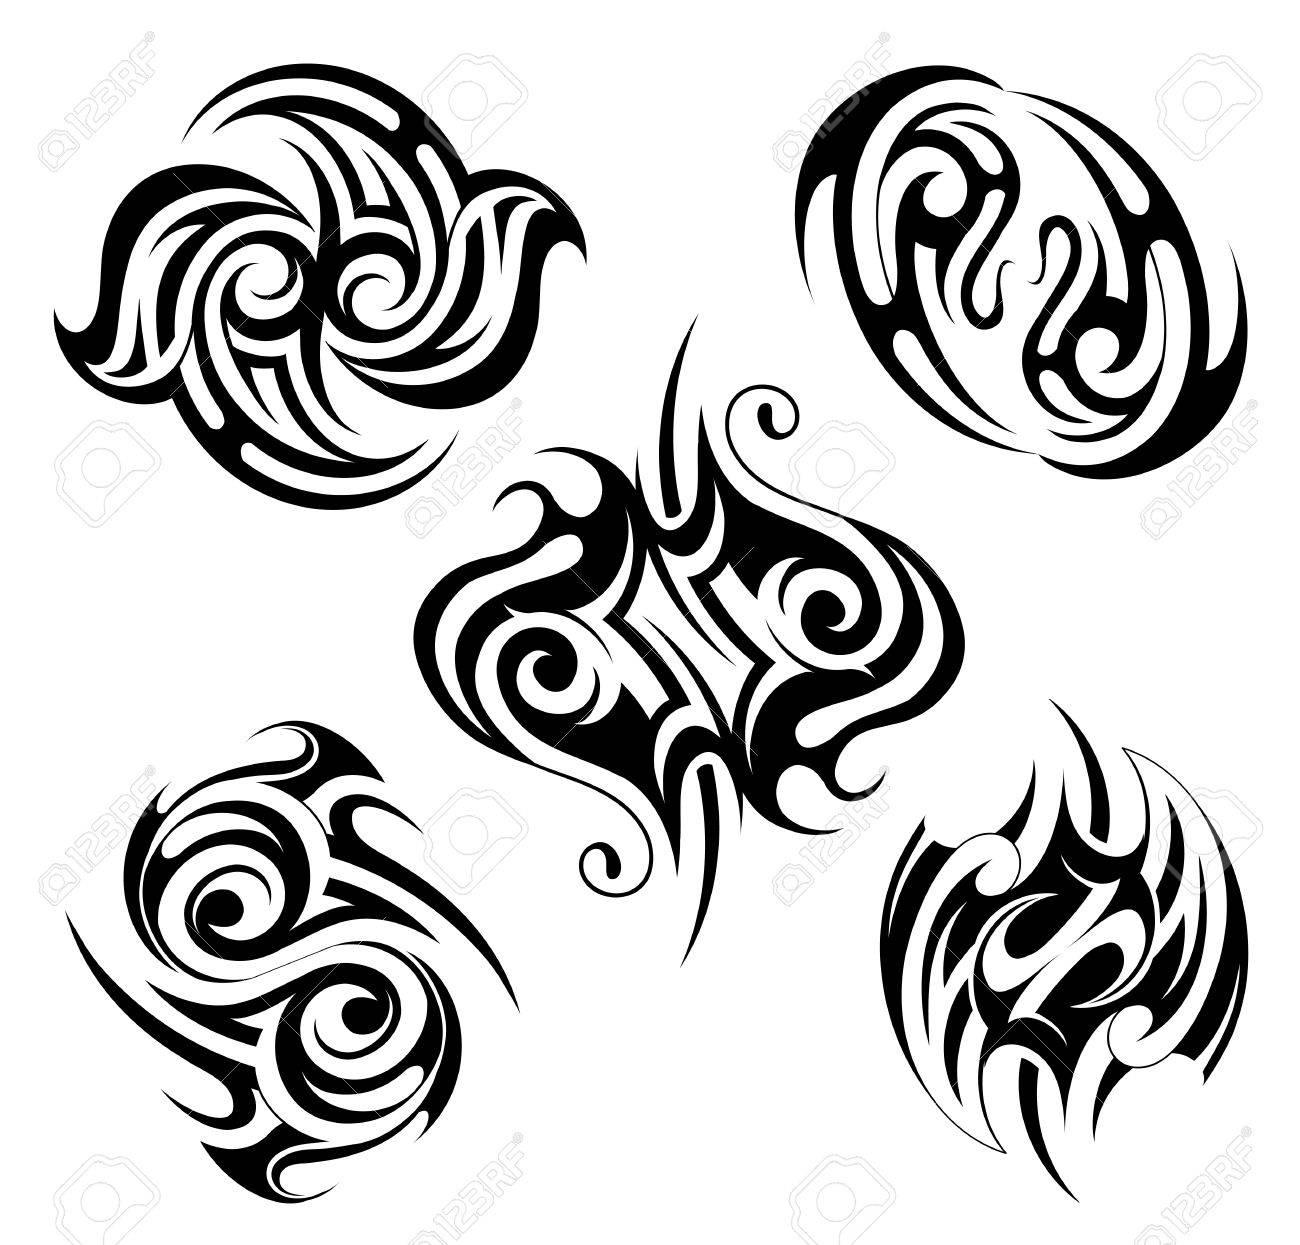 tatouage tribal gothique